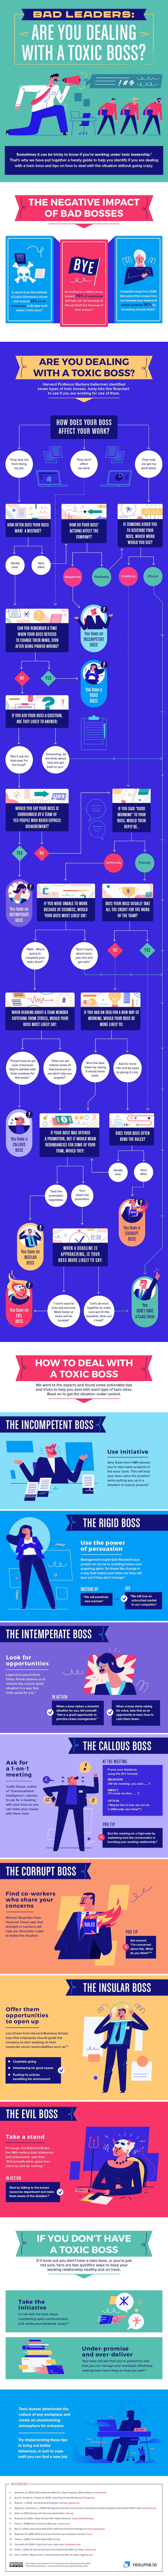 Toxic boss flowchart infographic